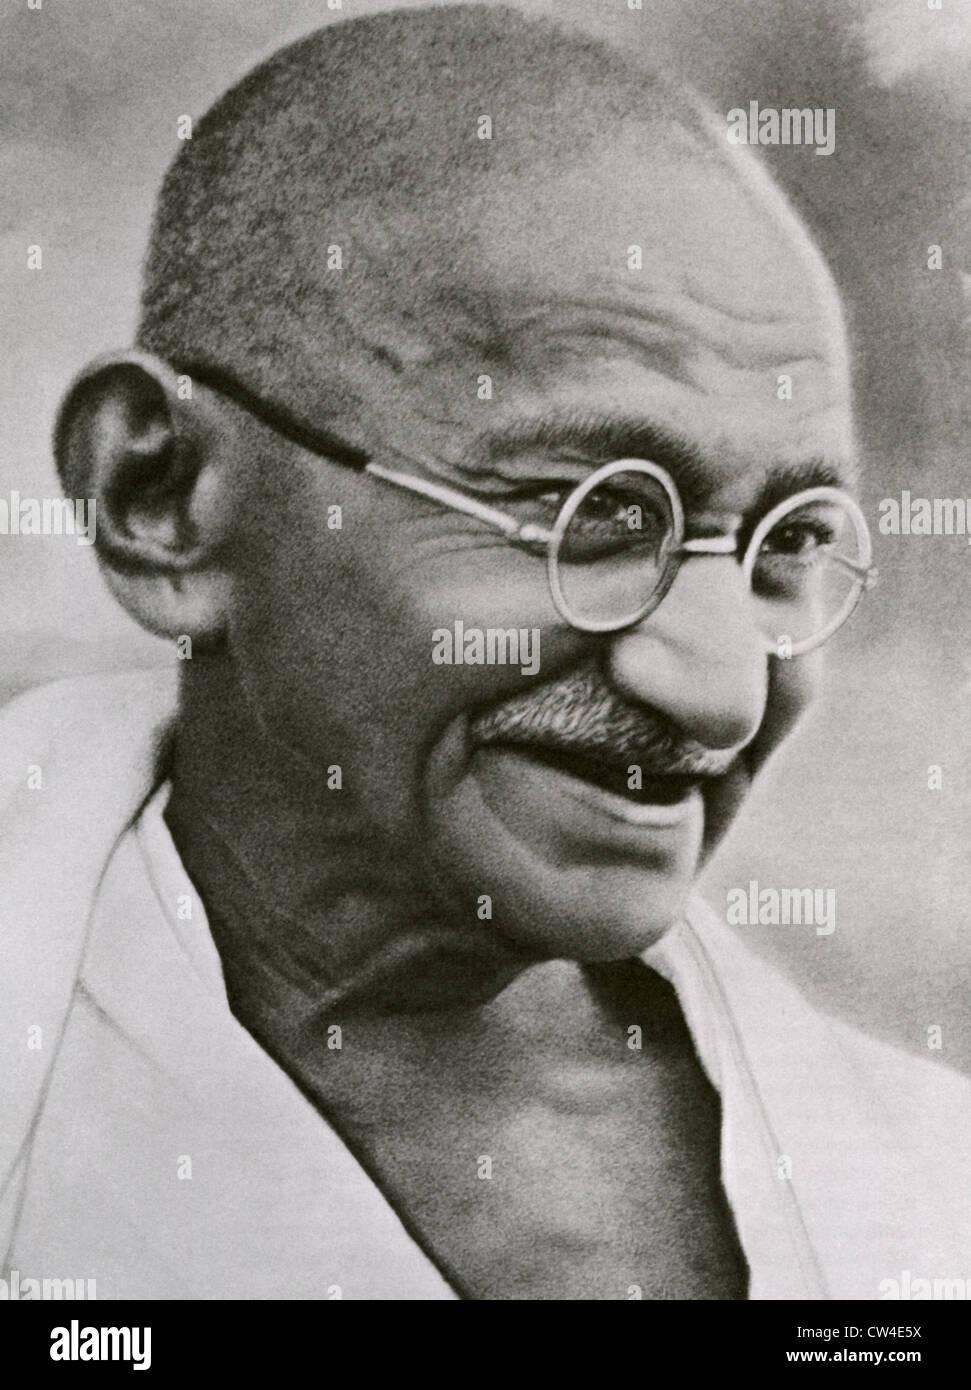 MOHENDRAS GANDHI (1869-1948) Indian political leader - Stock Image